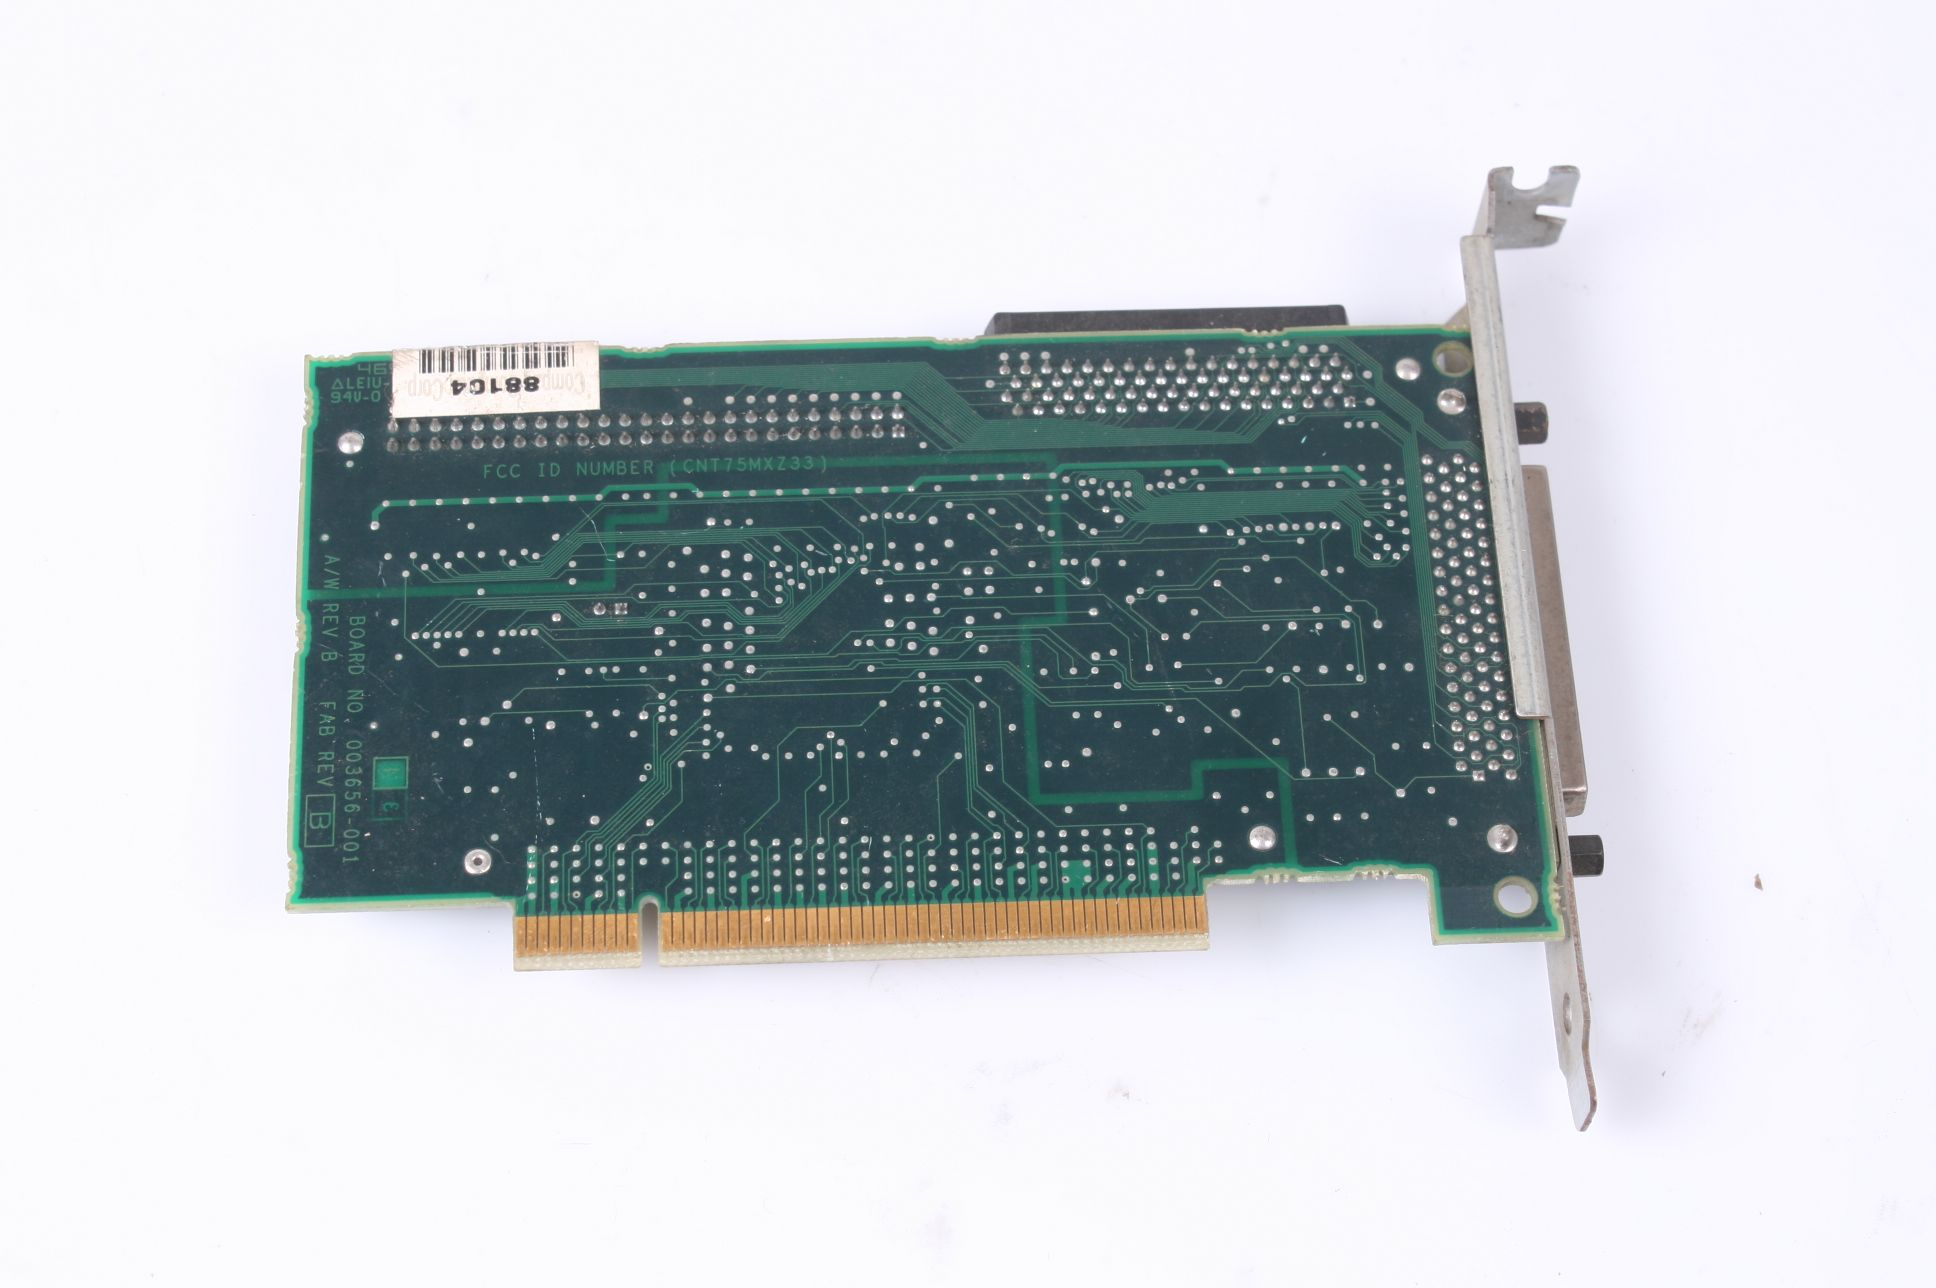 COMPAQ RAID Controller SCSI-2/P PCI CARD 003654-002